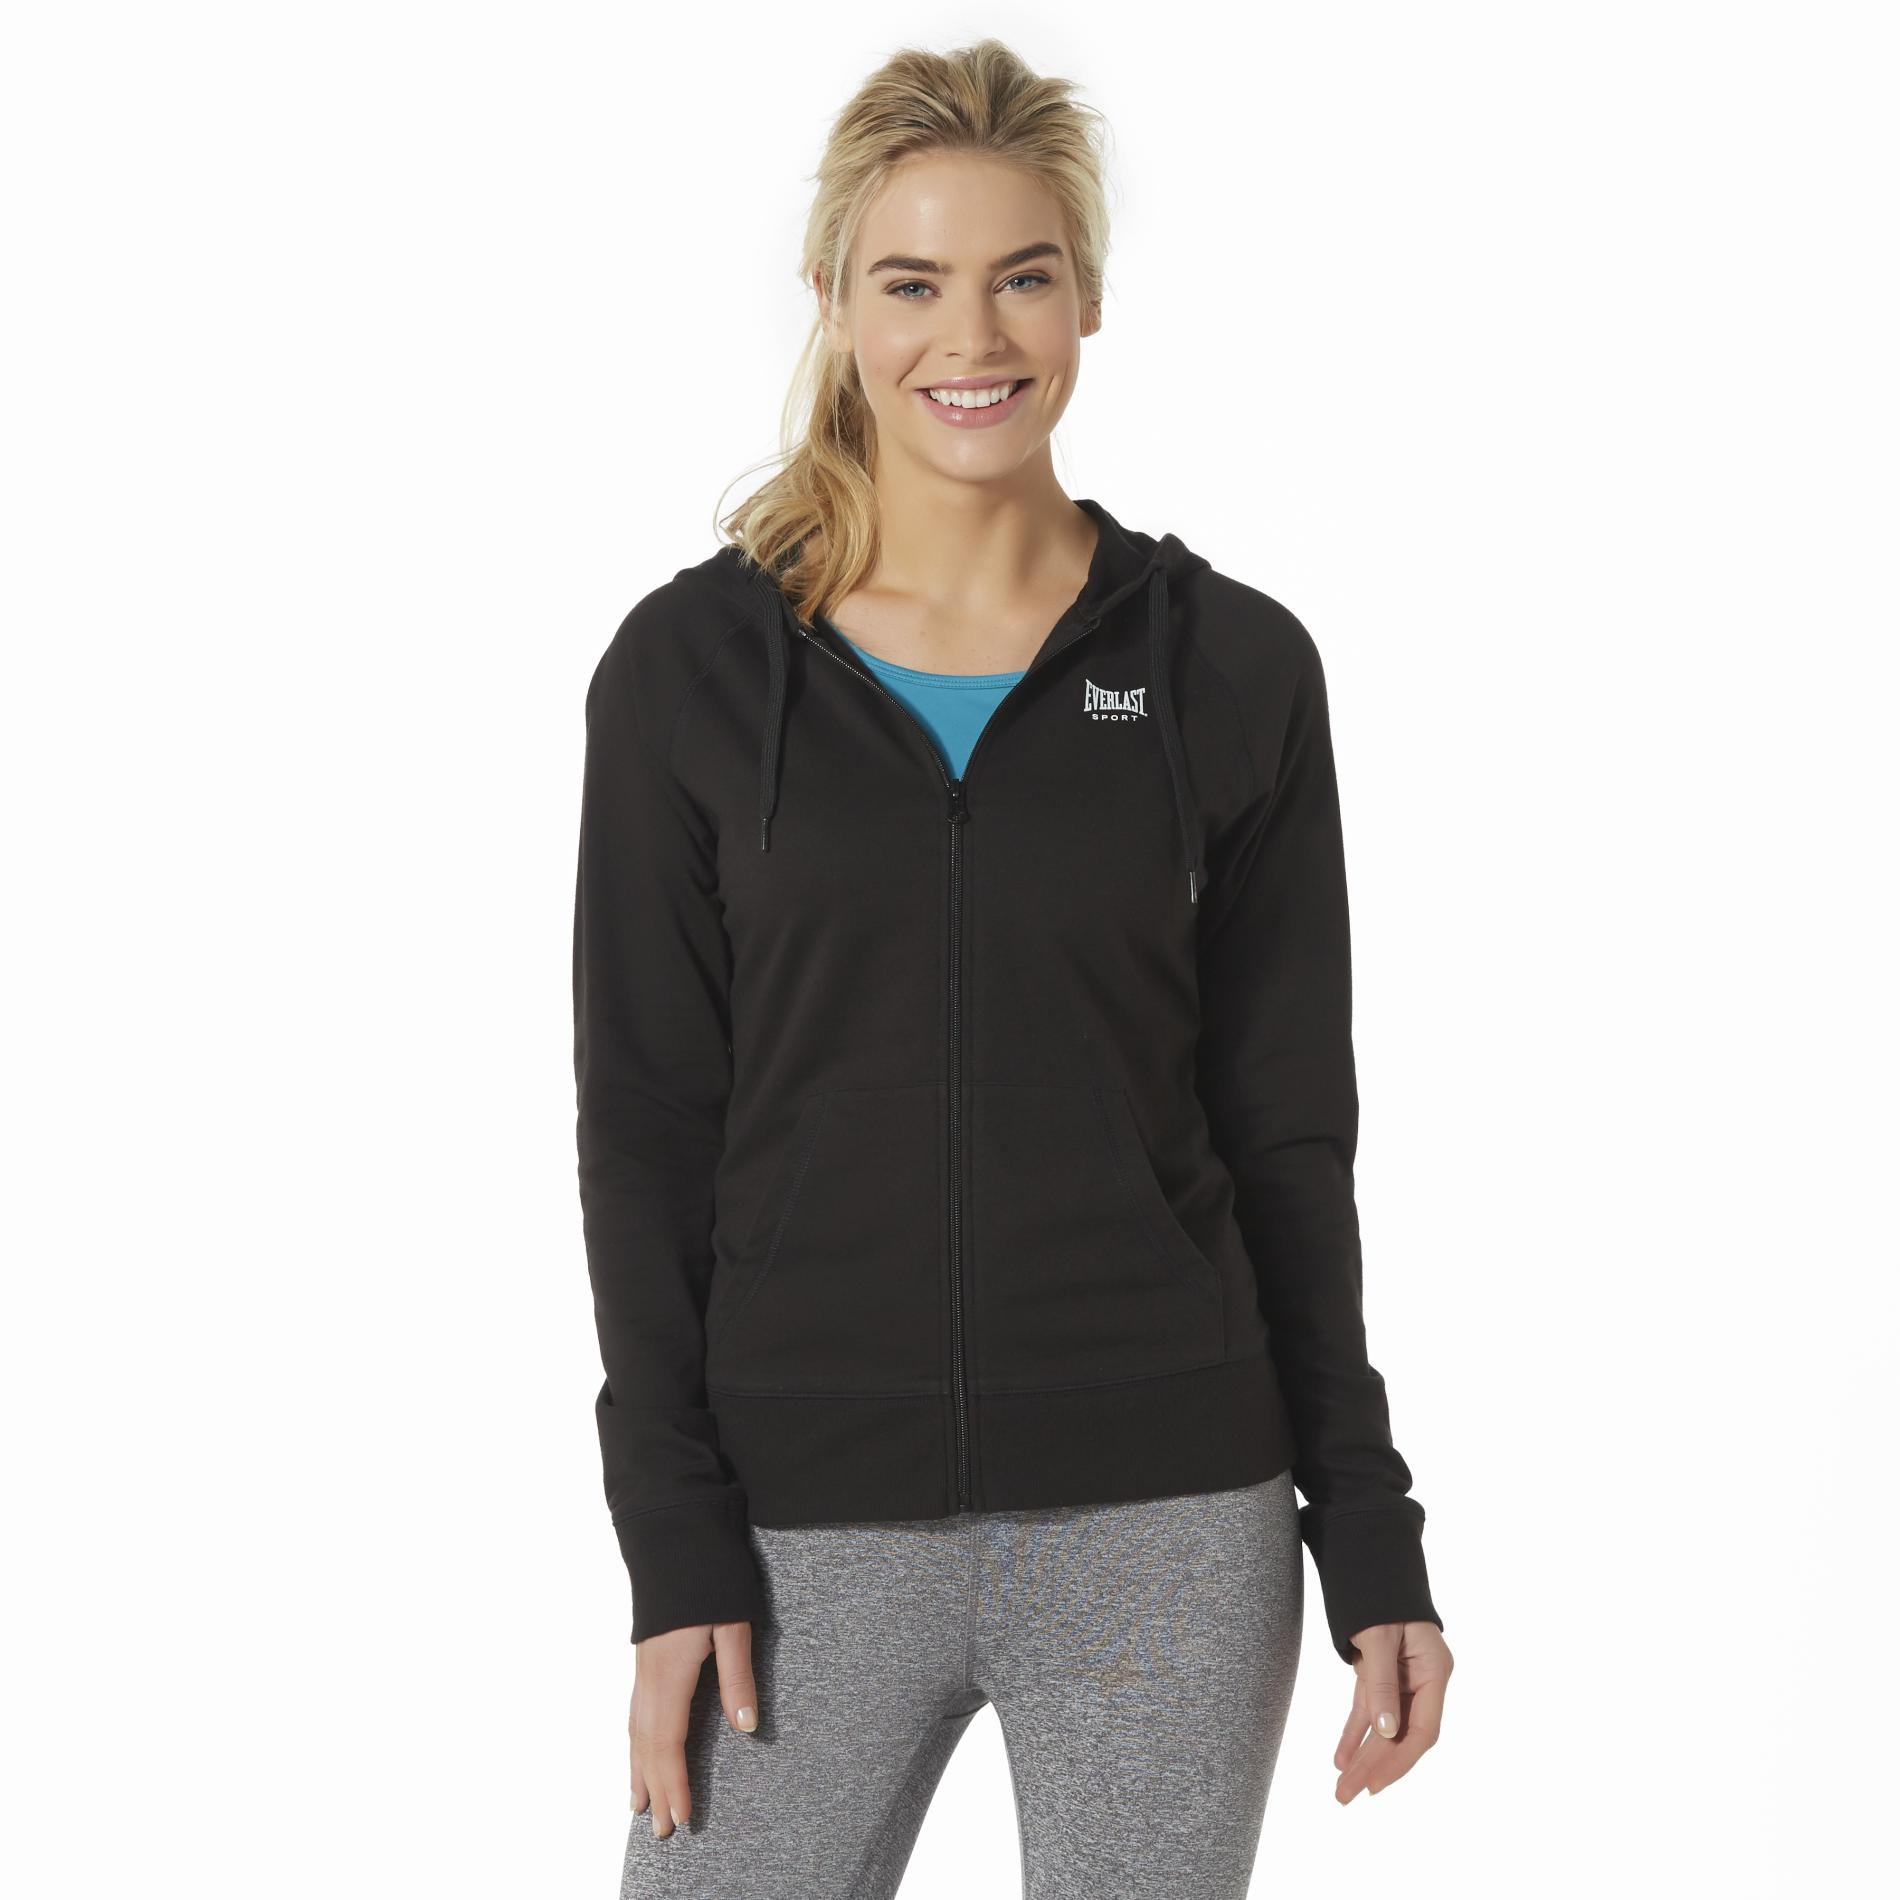 Everlast® Sport Women's Athletic Hoodie Jacket PartNumber: 027VA86747812P MfgPartNumber: WS6EV74160MI